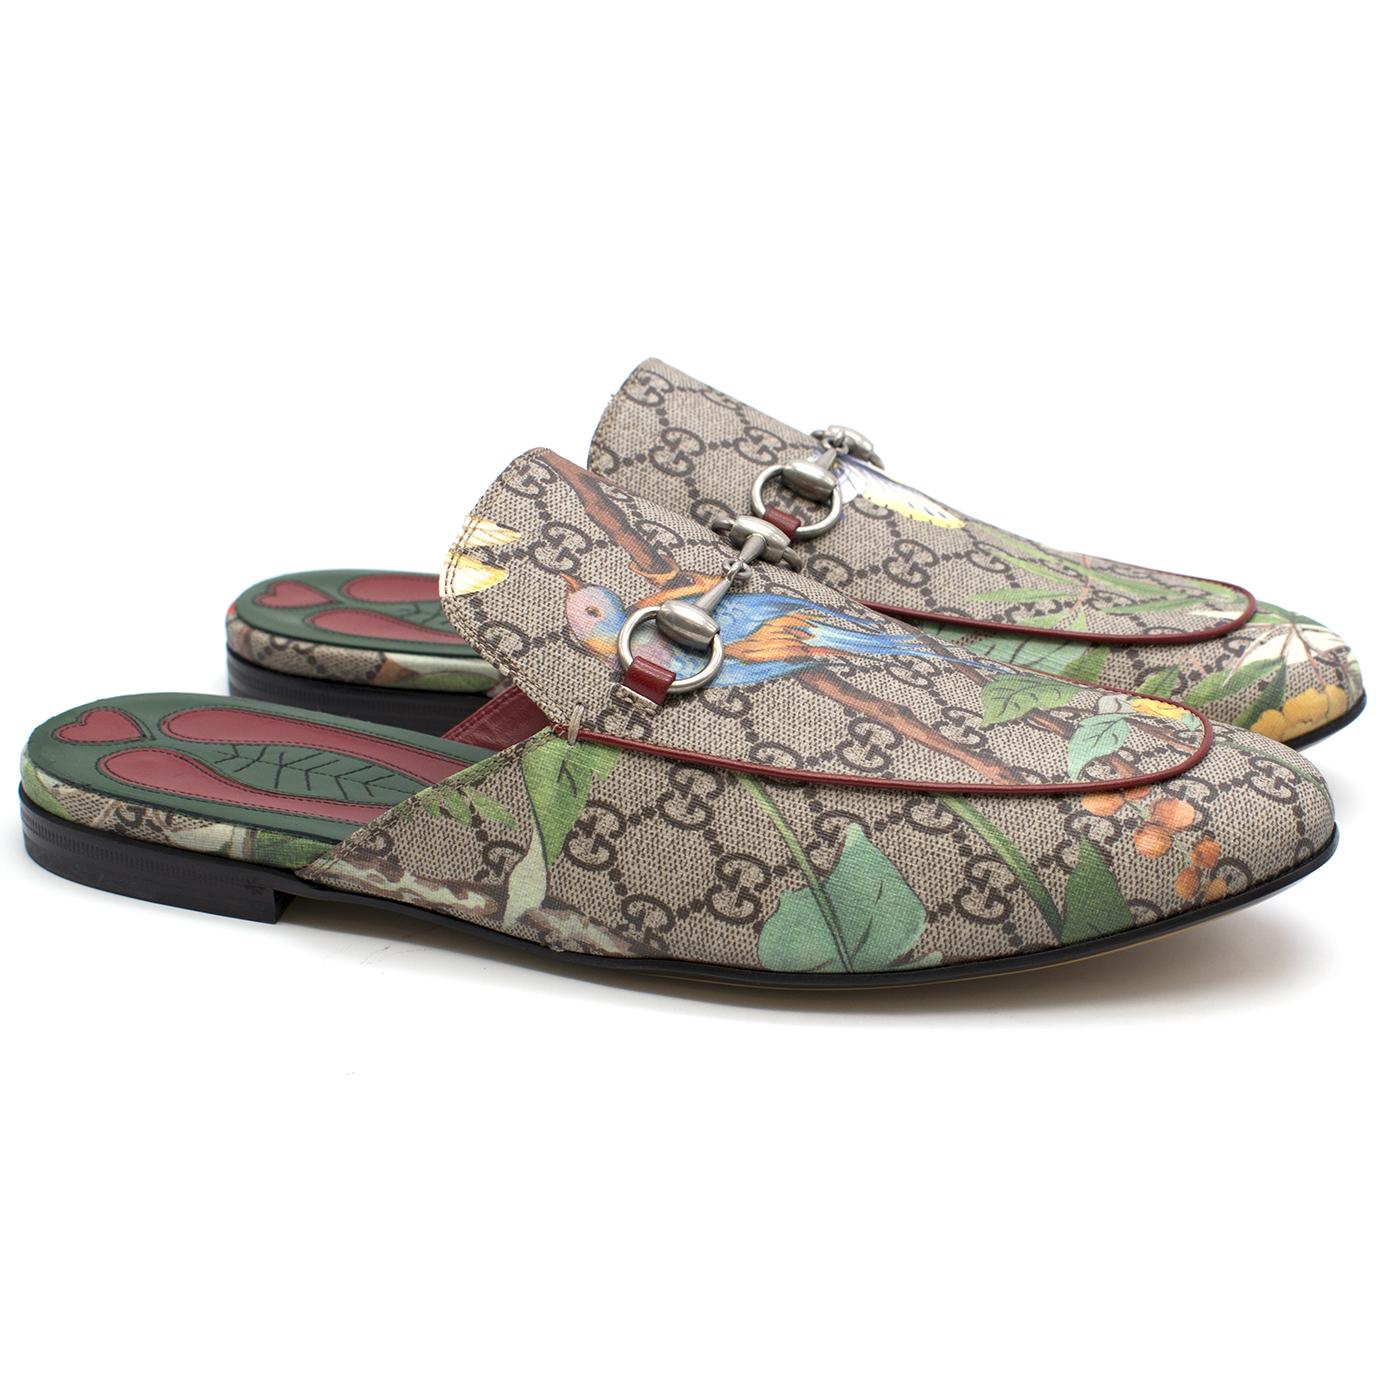 fdab13a57 Gucci Mens Princetown Gg Supreme Tian Print Slippers123451